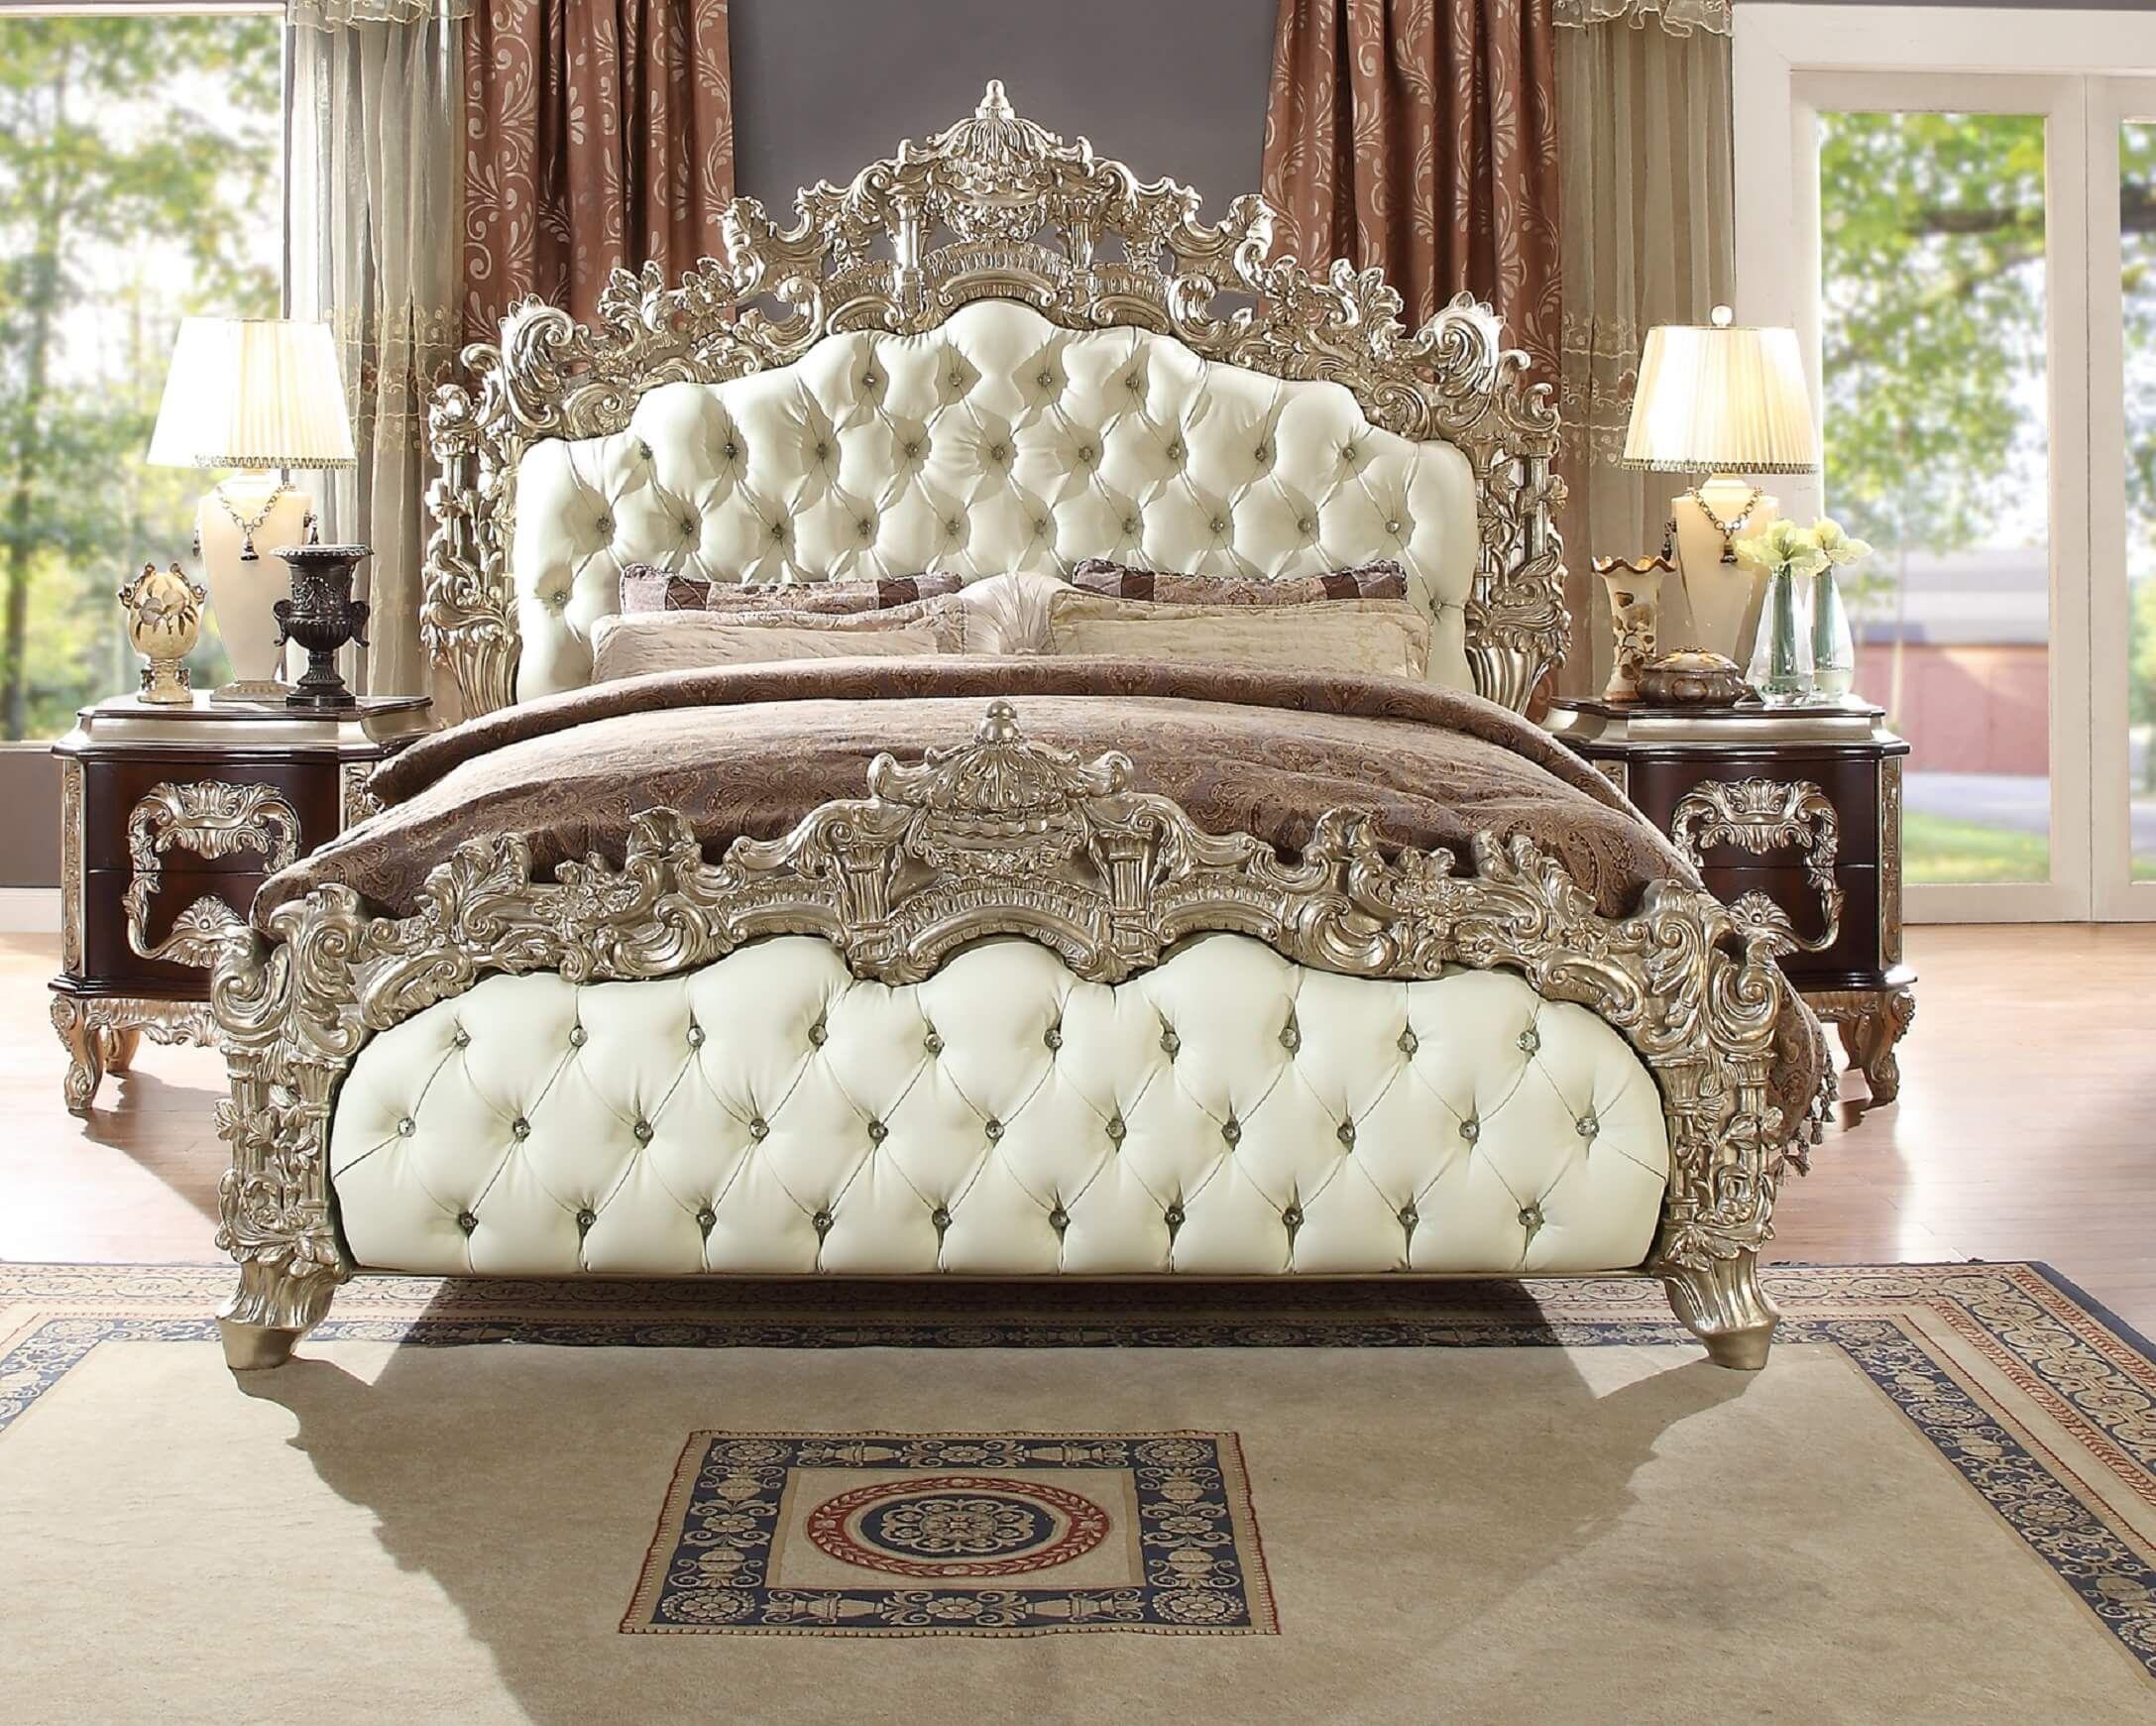 Homey Design Hd 8017 Cleopatra Bed Traditional Bedroom Bedroom